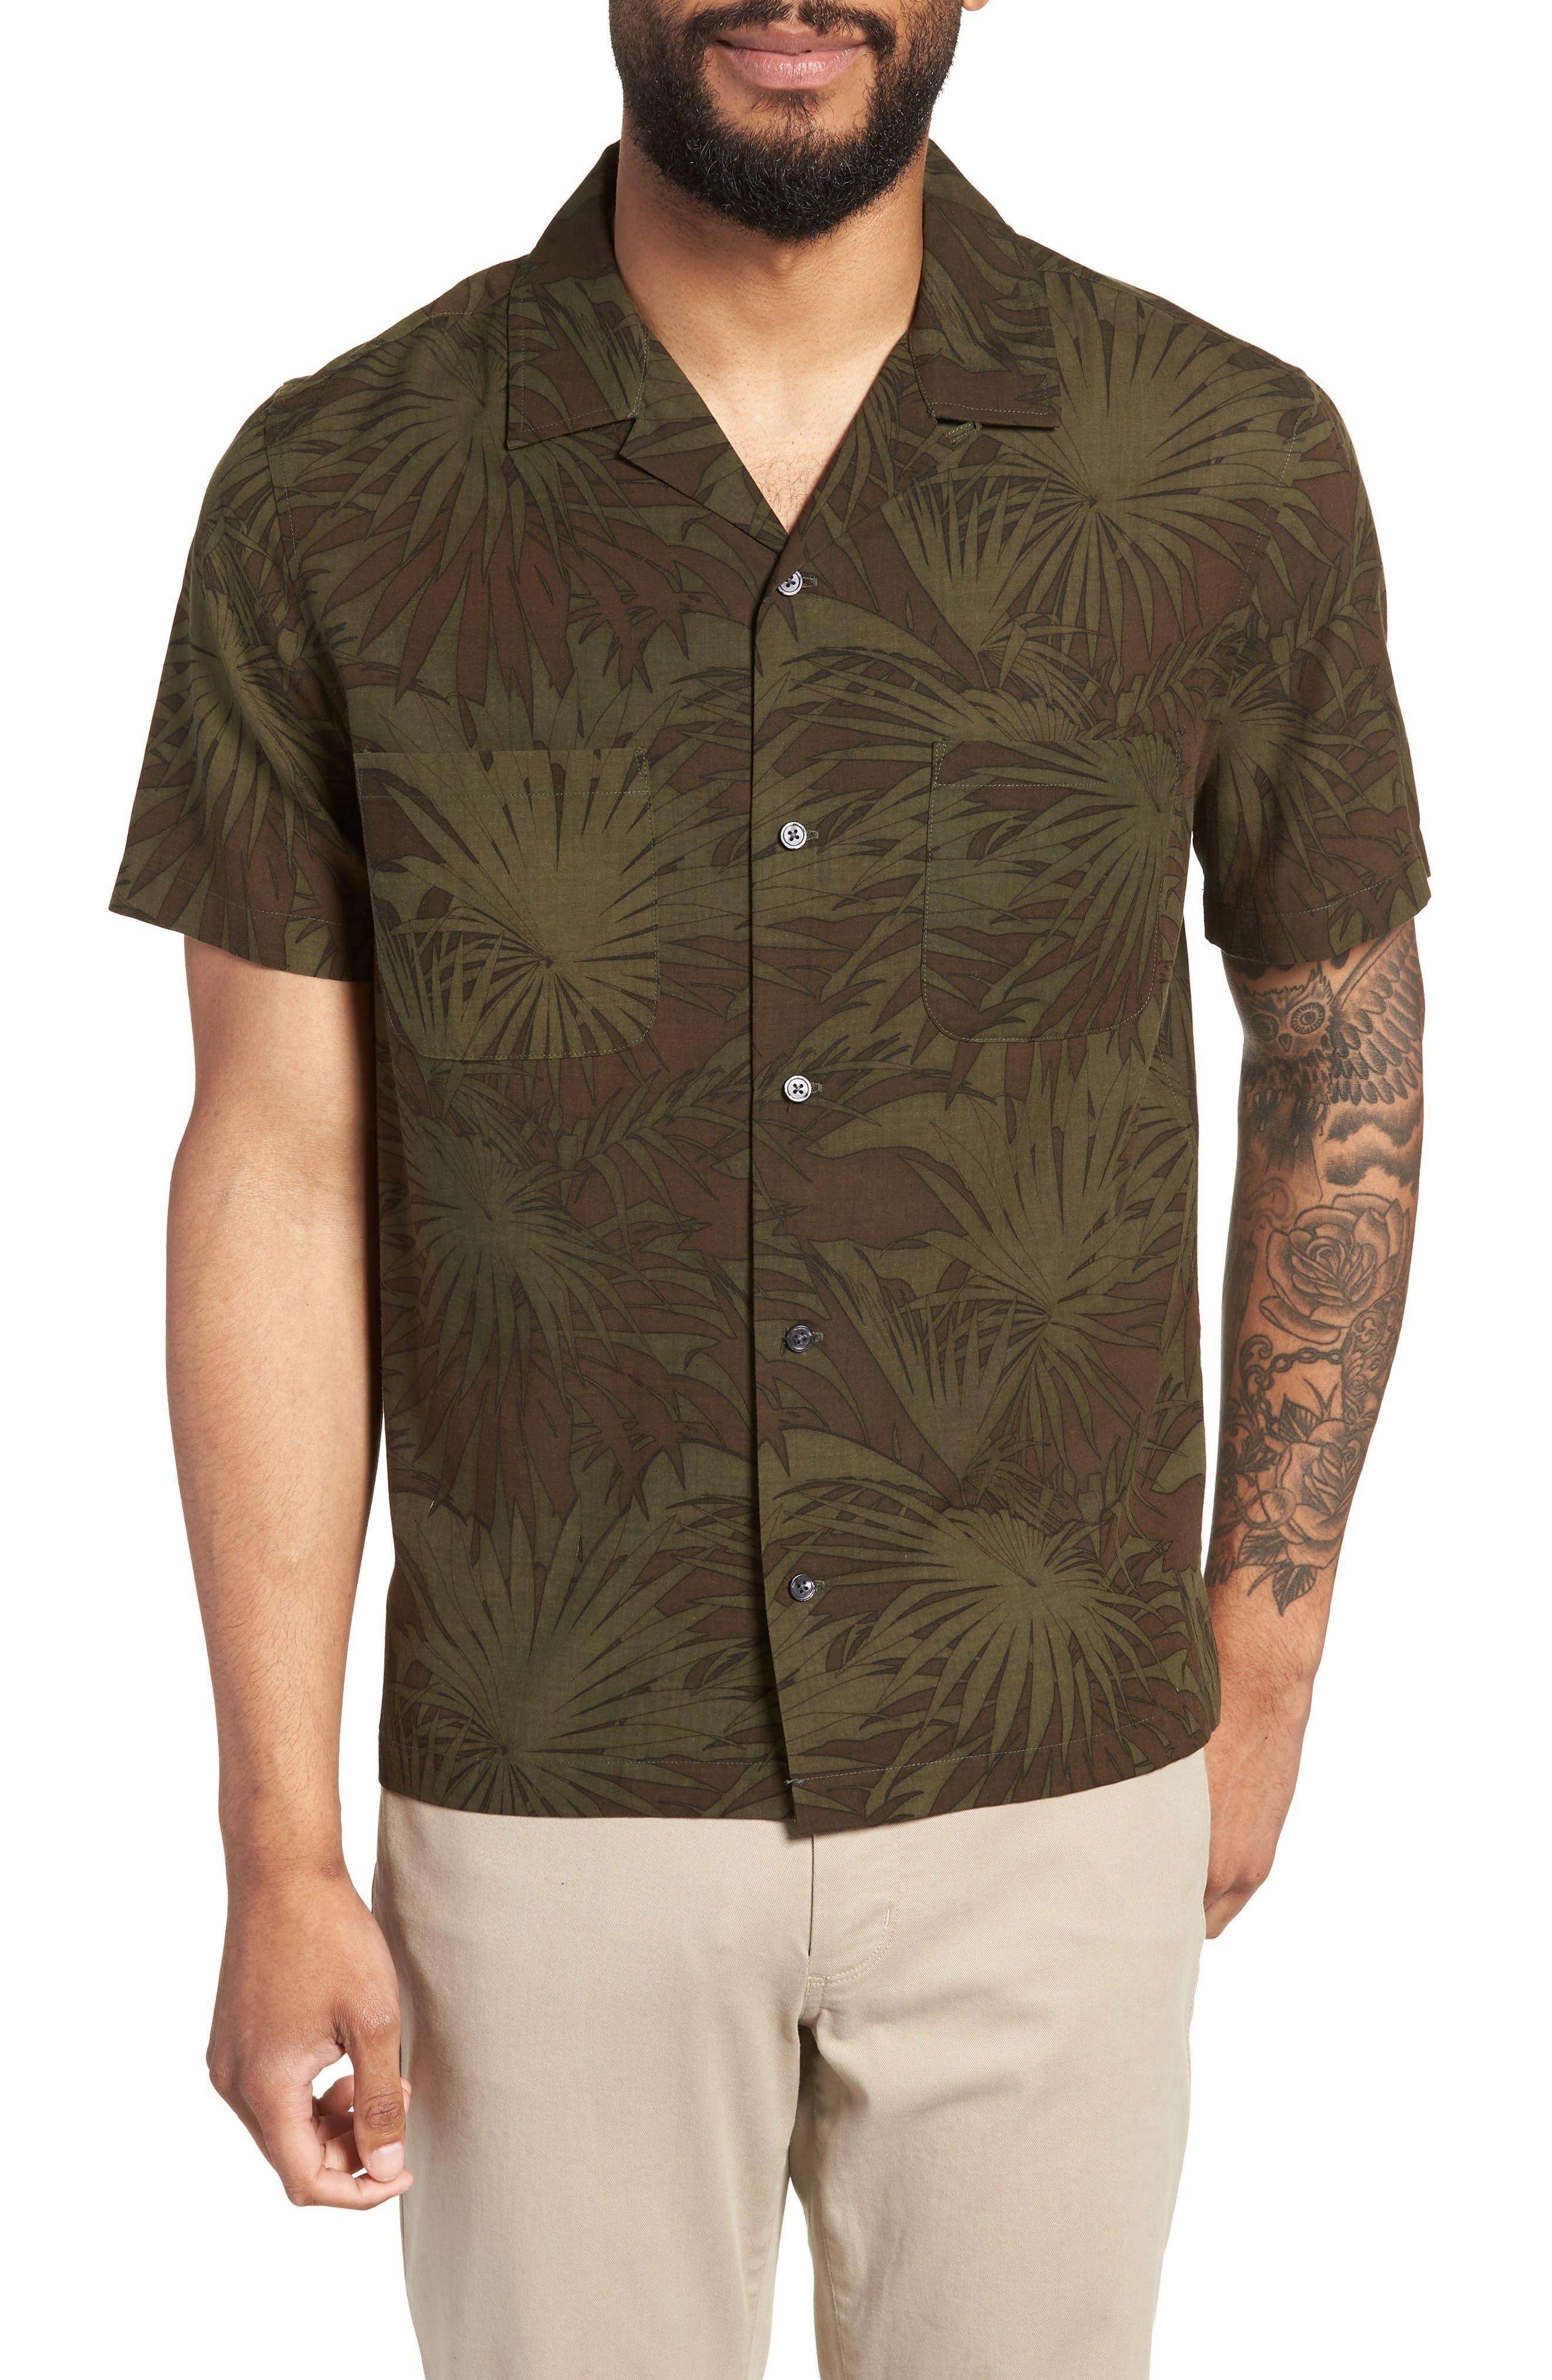 Palm Leaf Cabana Woven Shirt,                             Main thumbnail 1, color,                             FOLIAGE/ DRIED HERB